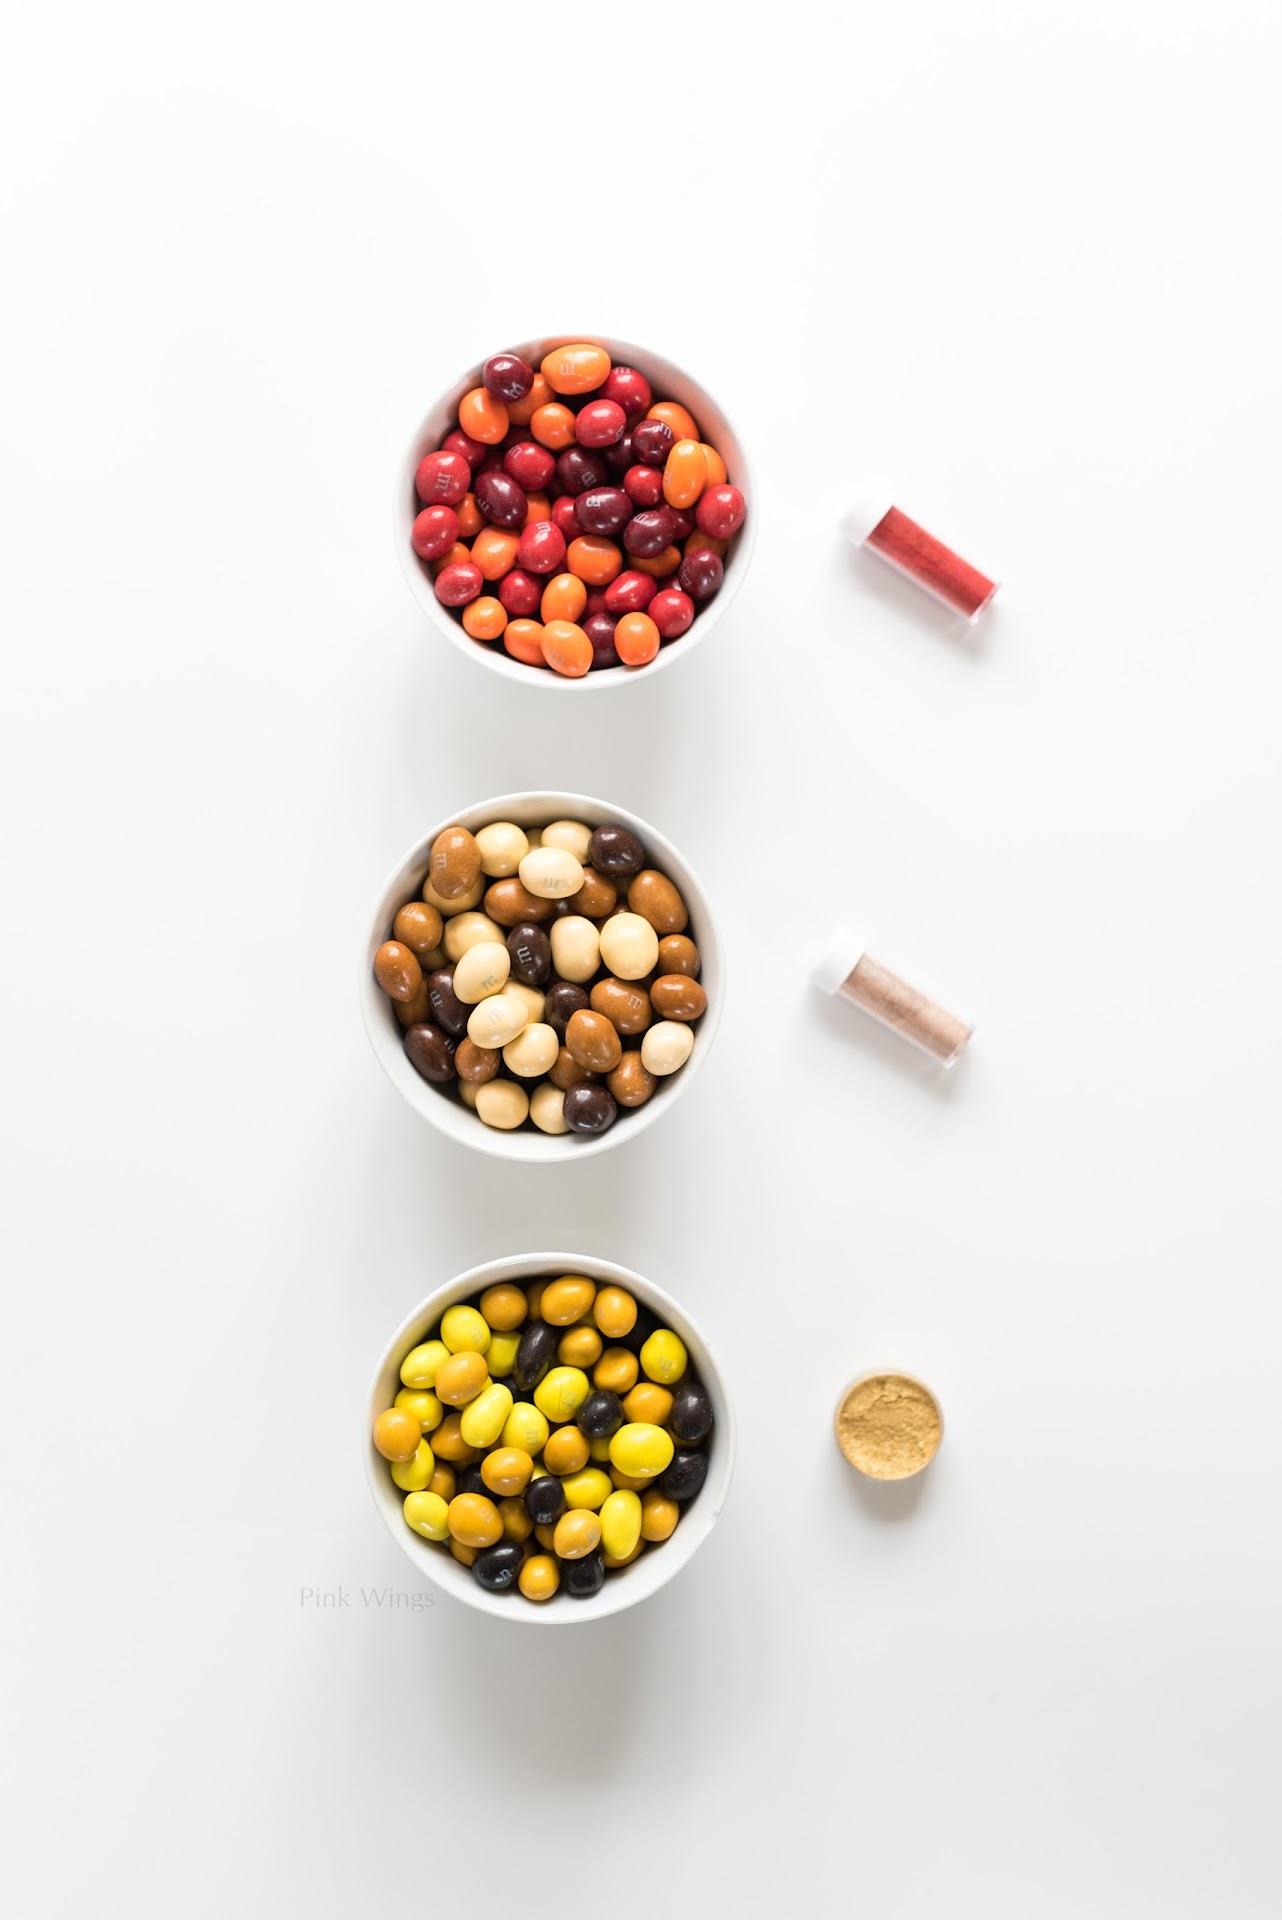 flavor vote, coffee chocolates, honey chocolates, chili chocolates, how to decorate chocolates, mars ambassador blogger